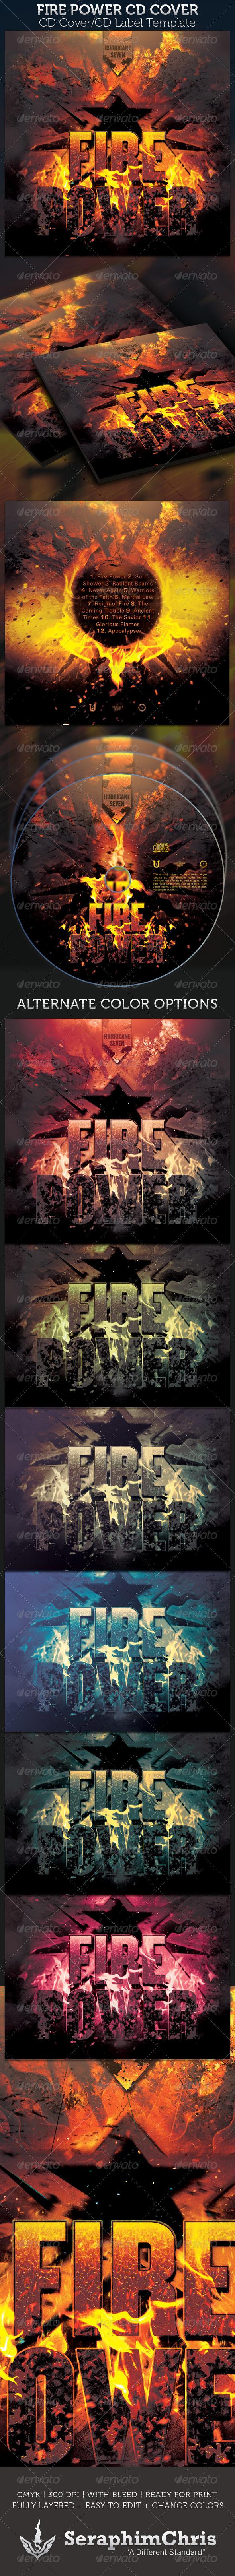 Fire Power CD Cover Template - CD & DVD Artwork Print Templates